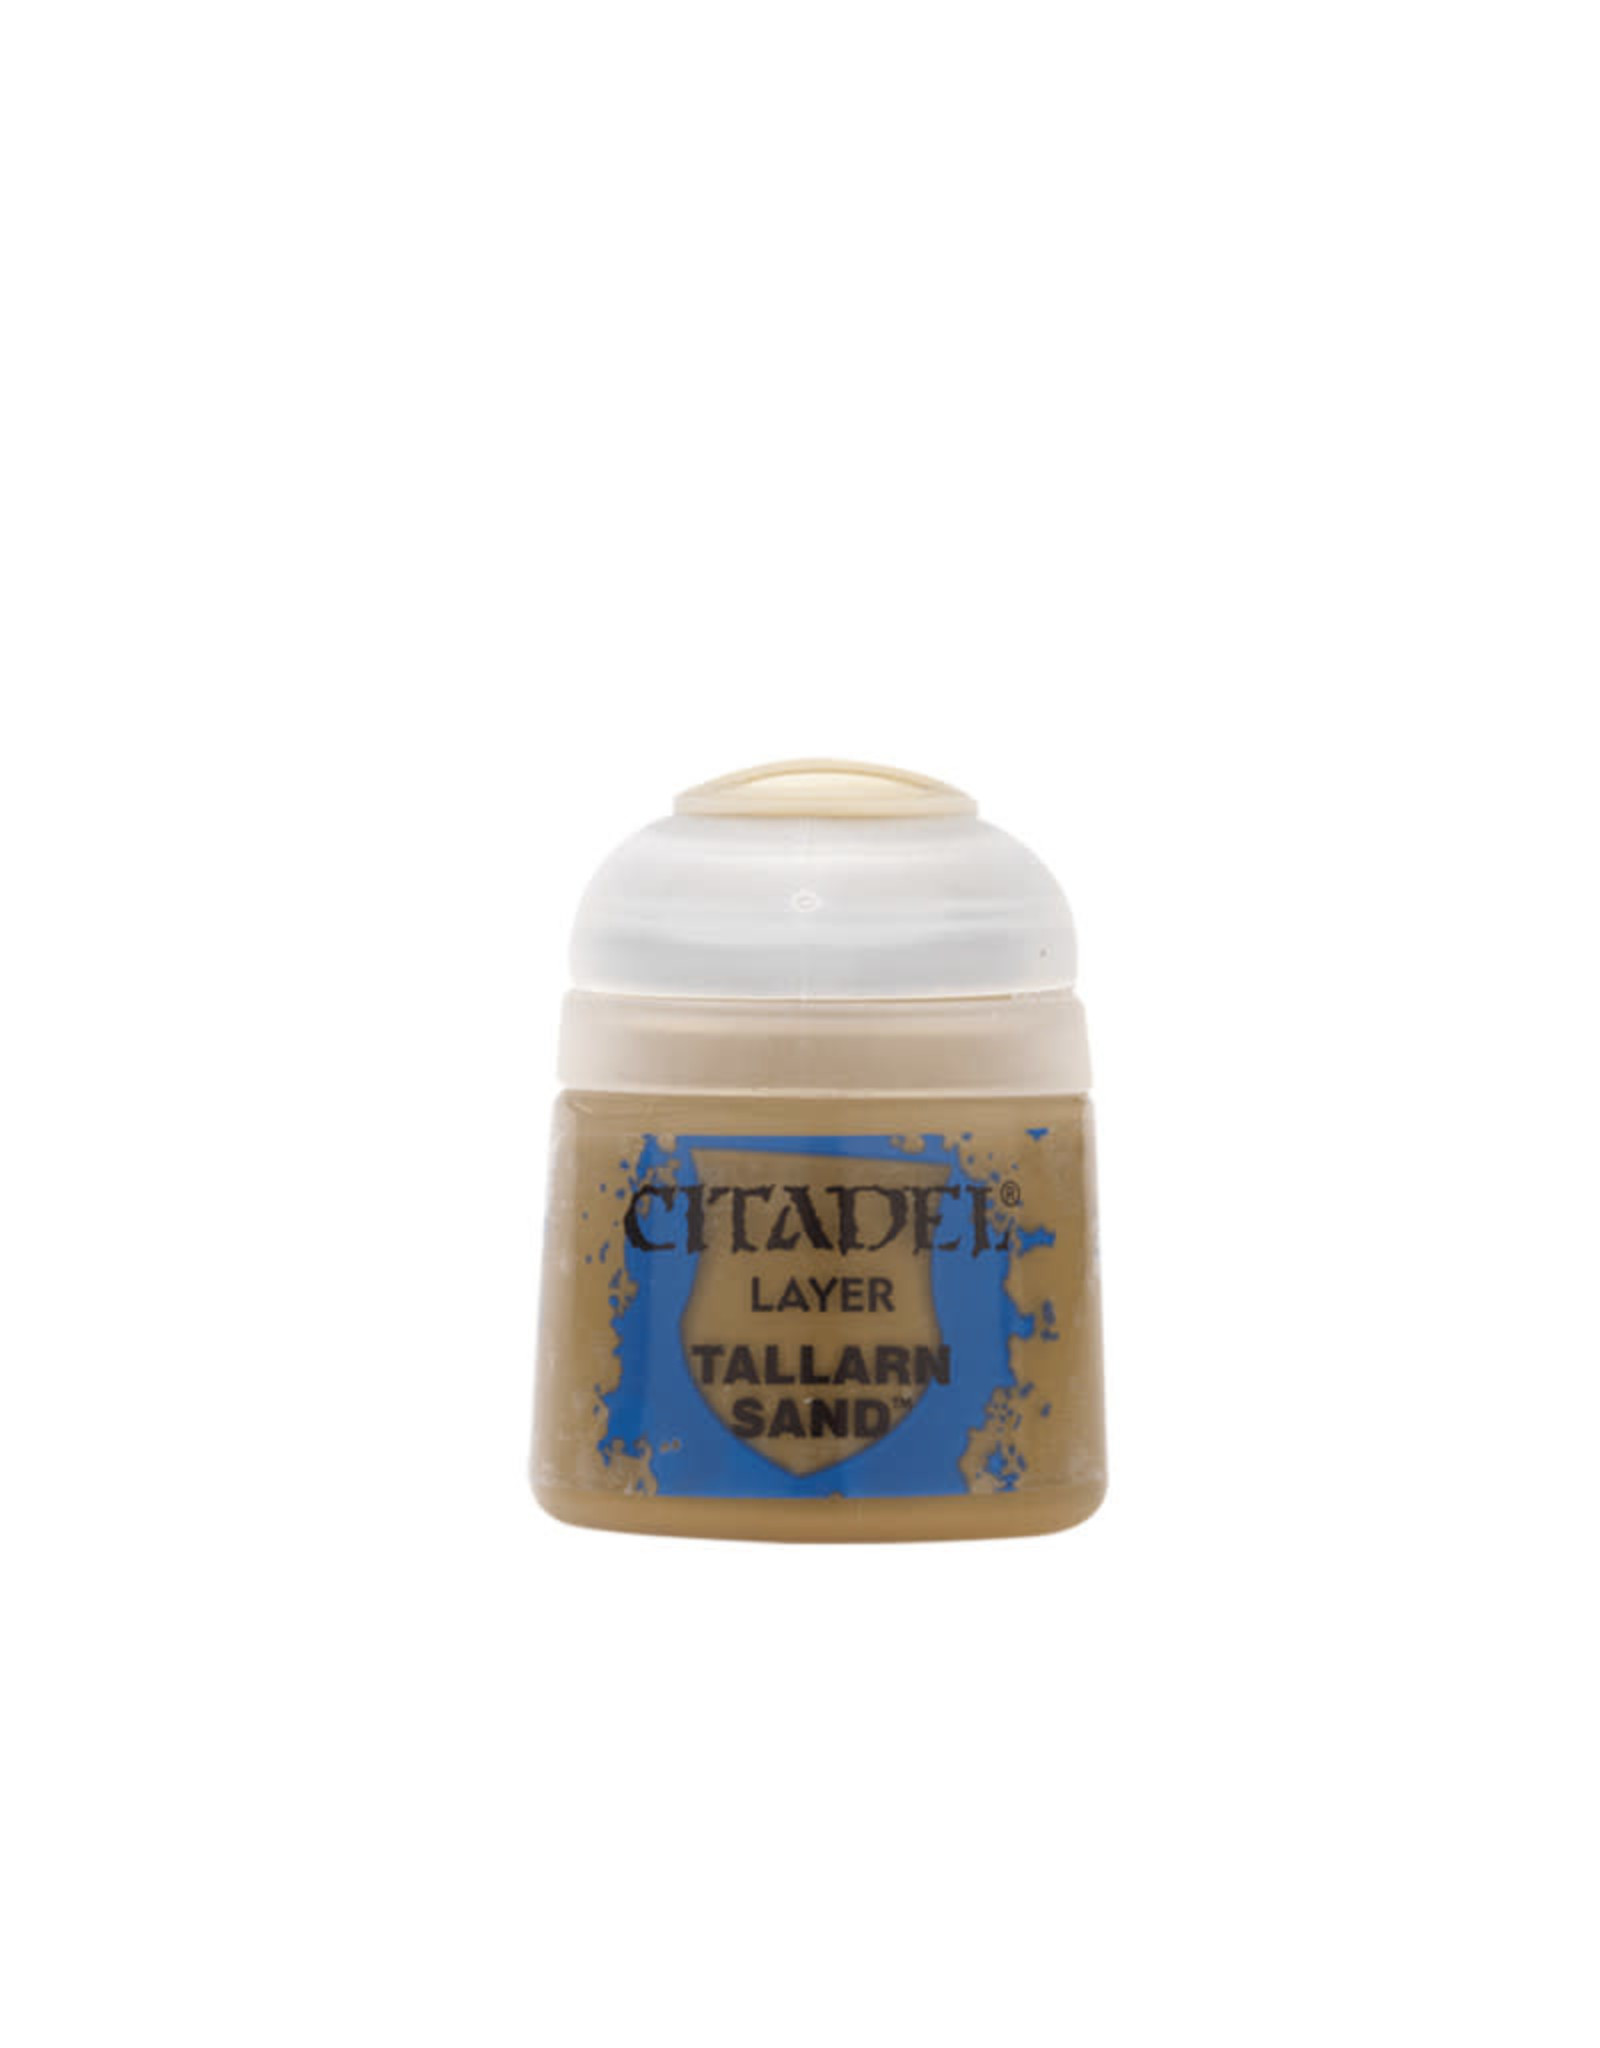 Citadel Layer Paint: Tallarn Sand